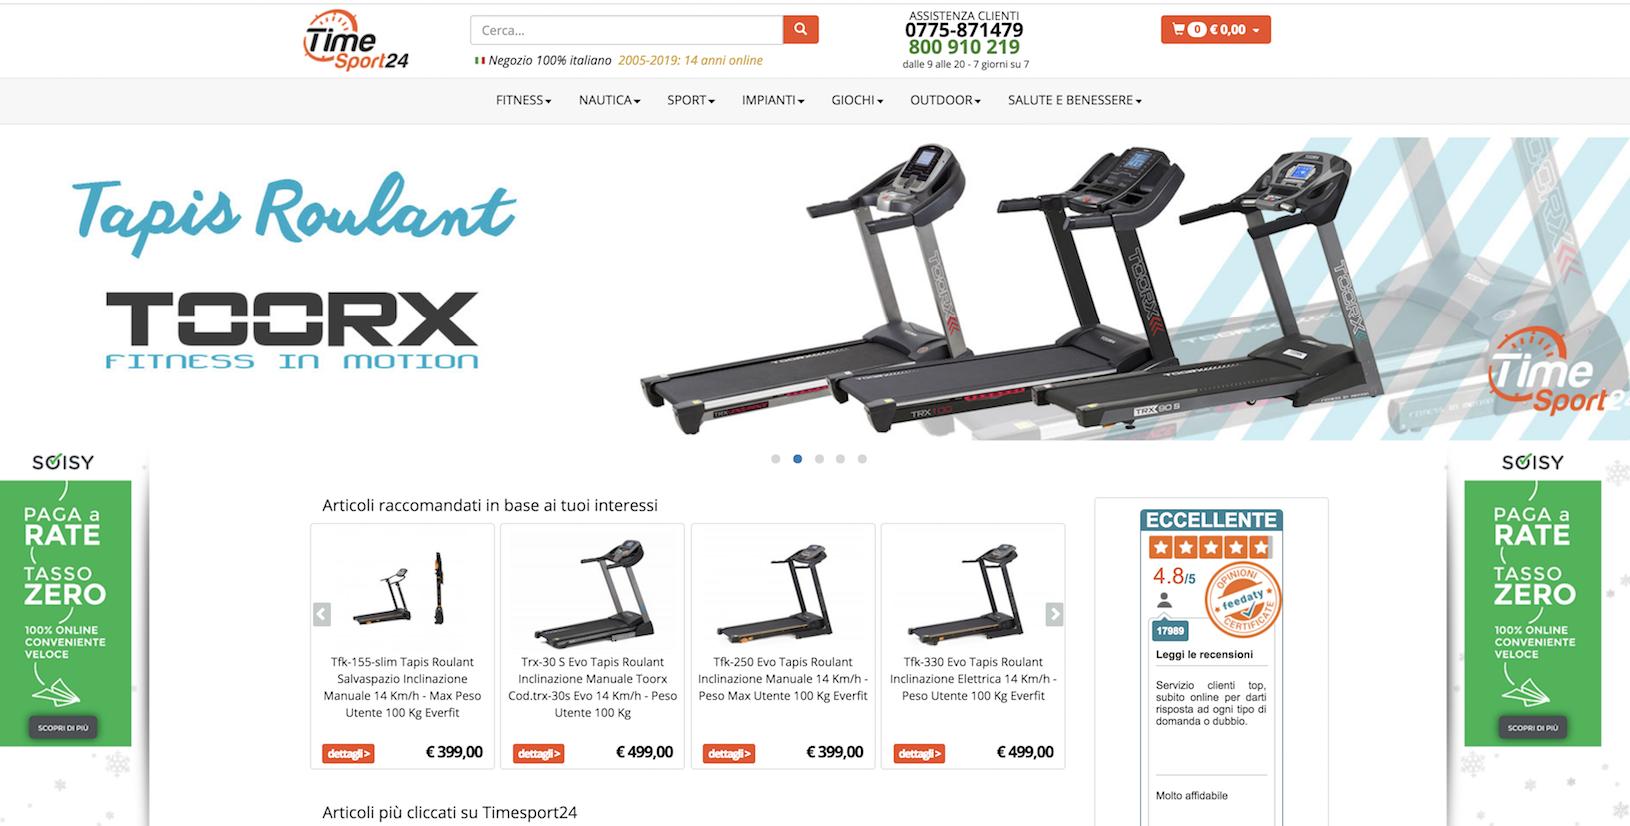 pagamento rateale Soisy: inserisci i nostri banner in homepage